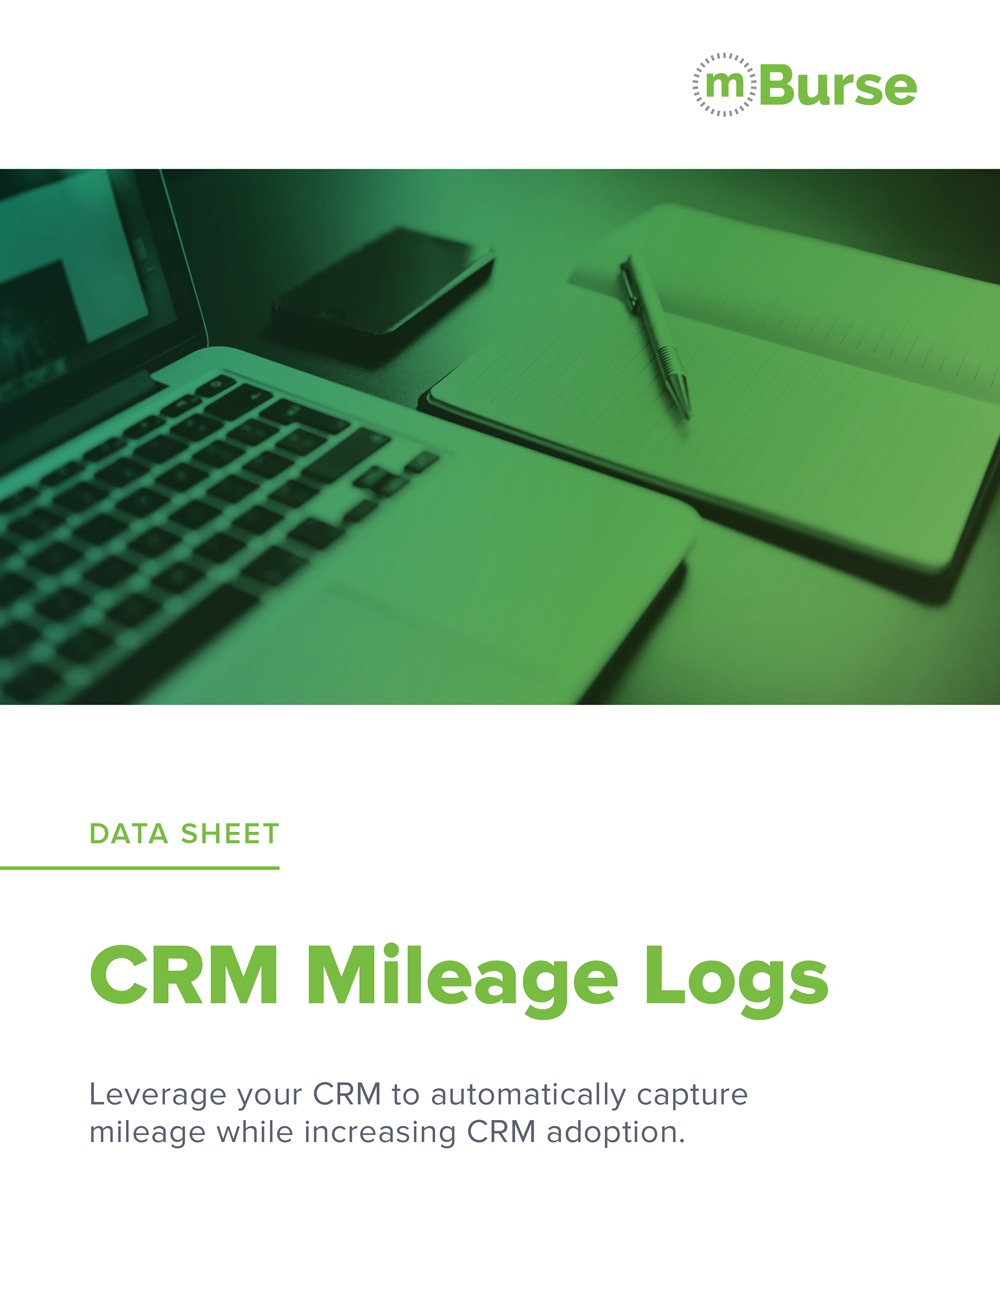 mBurse CRM Mileage log data sheet-1